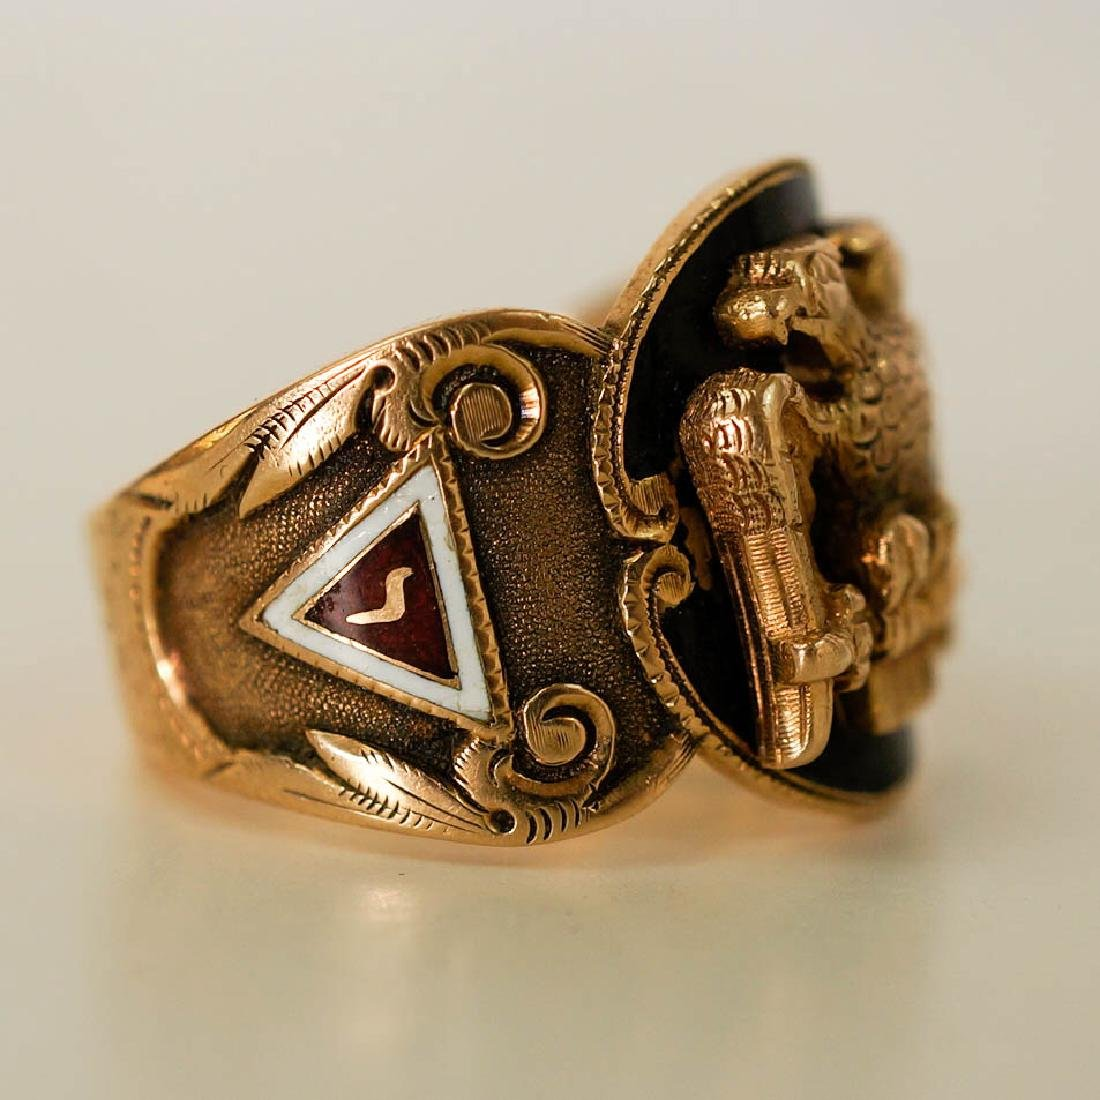 Vintage Masonic 14k Yellow Gold Enamel Ring - 3